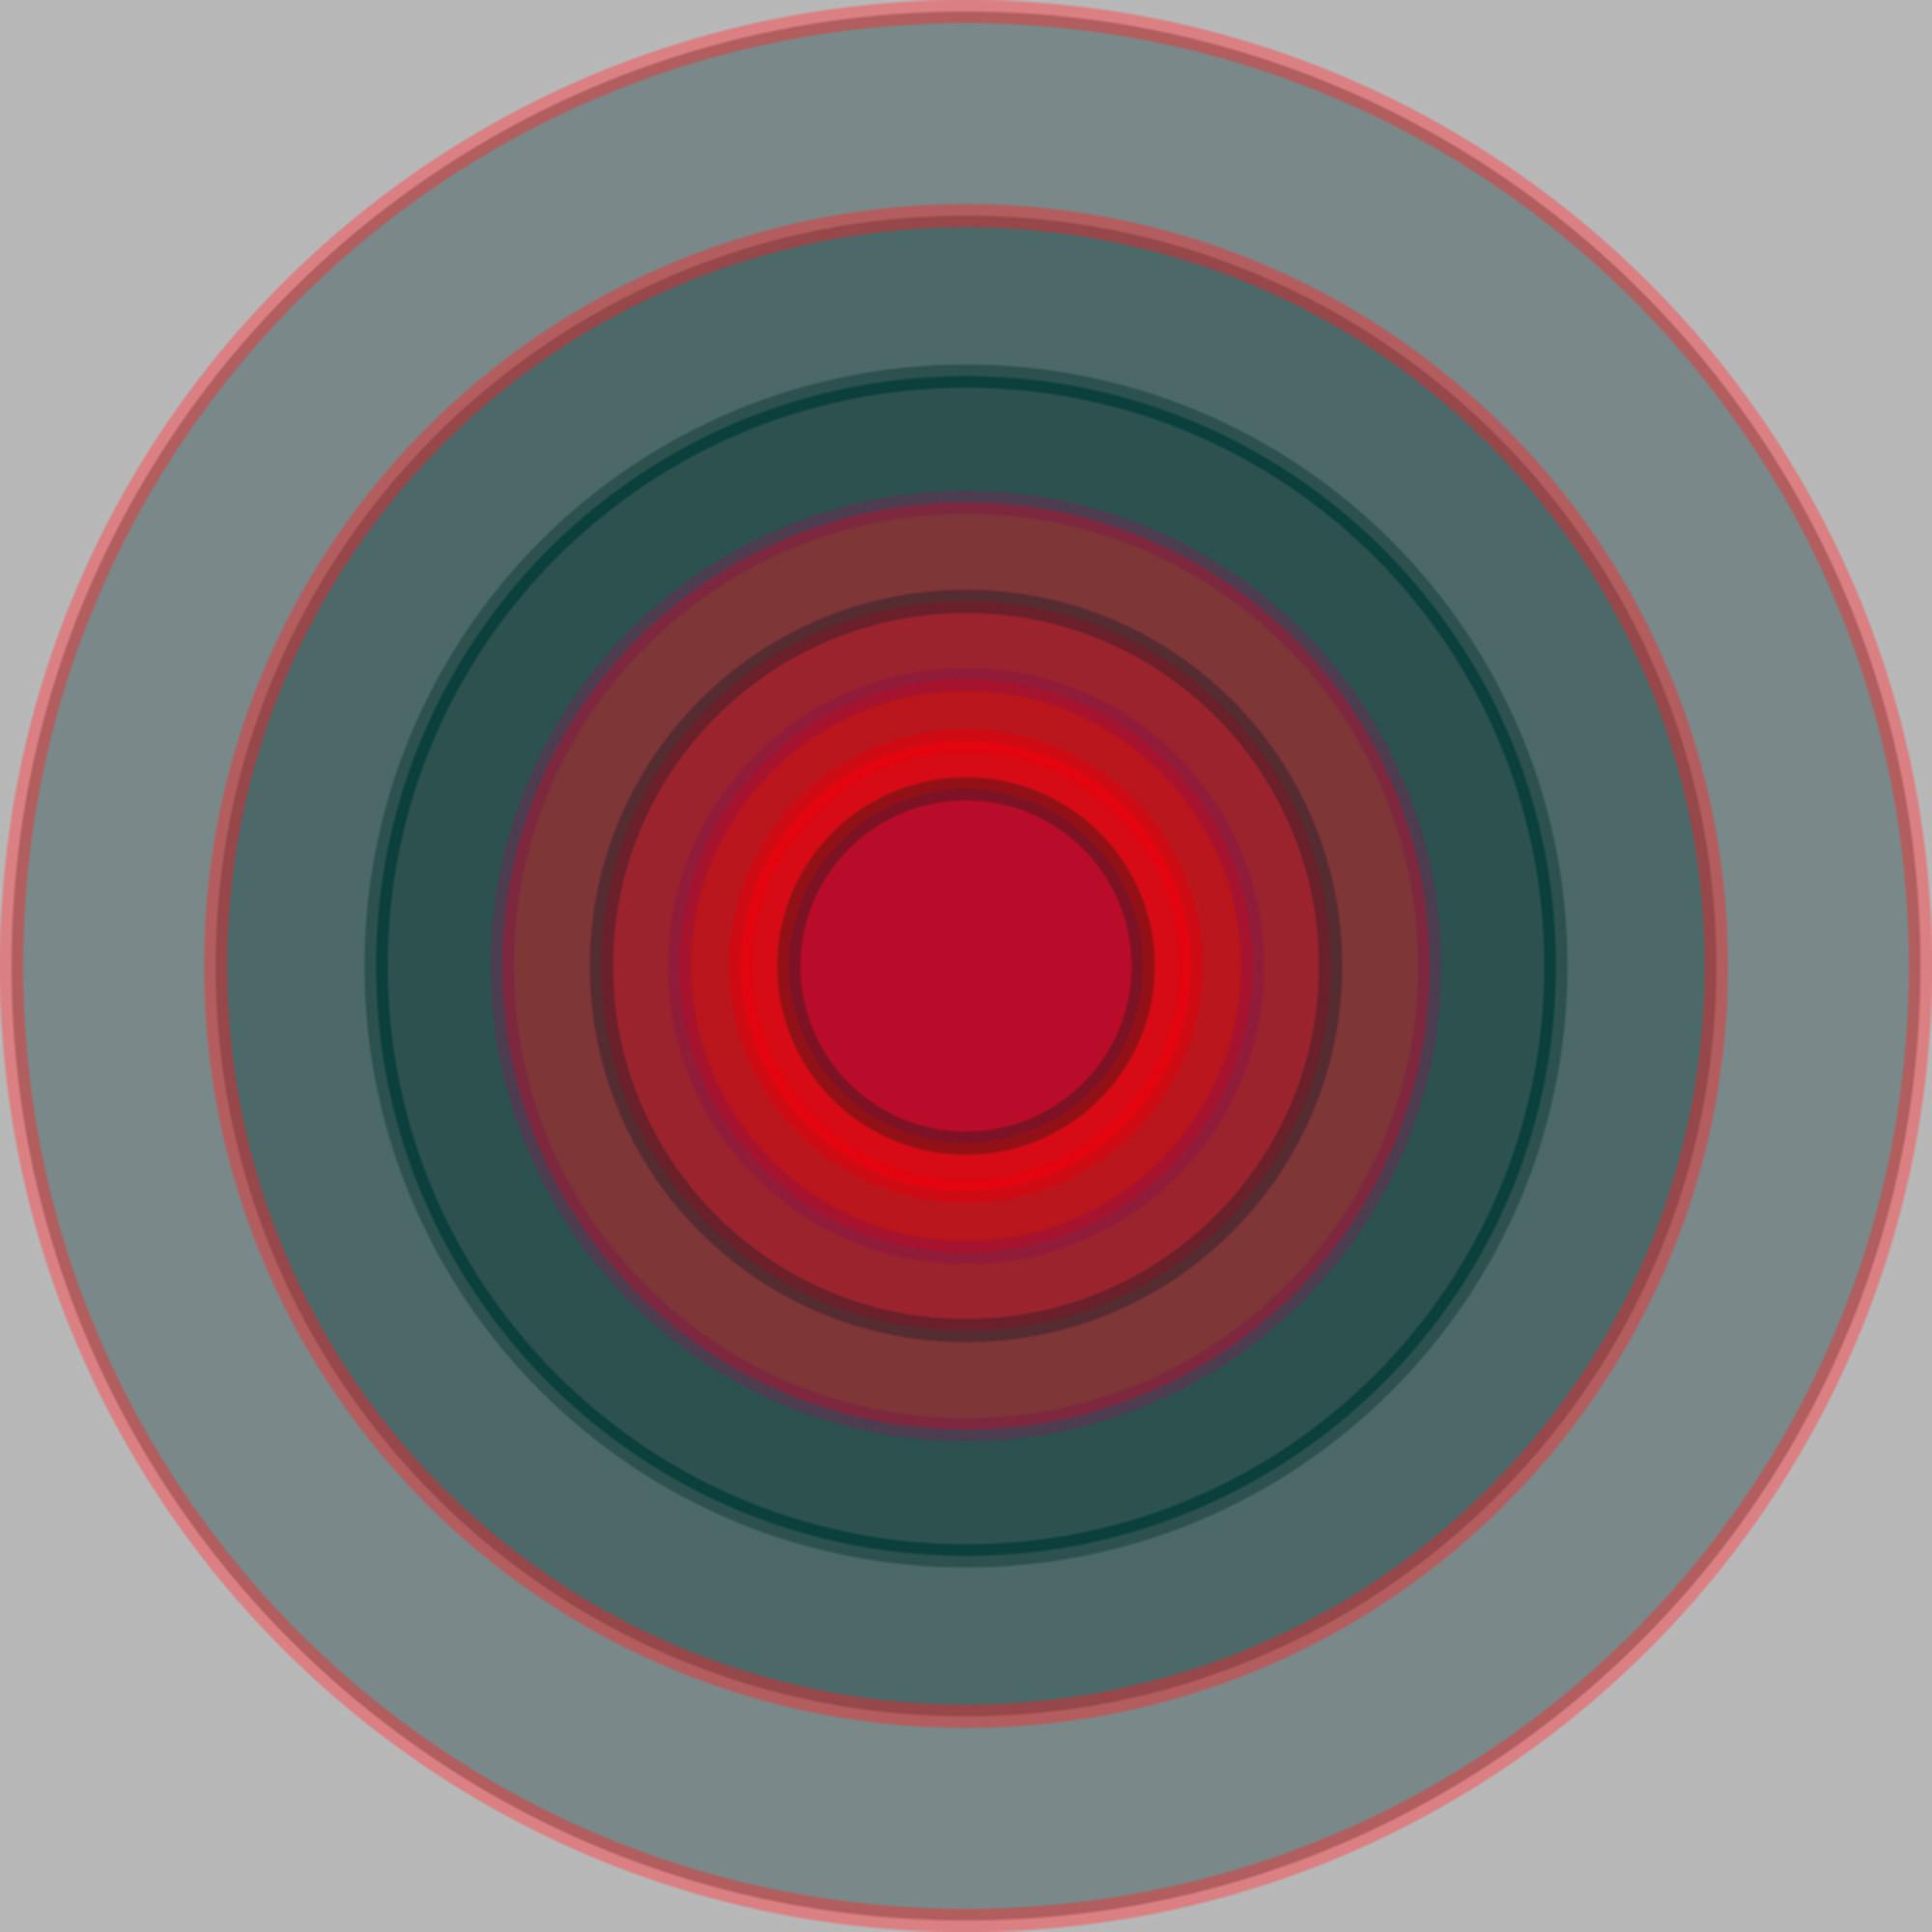 Circles3 0008 nj6o71